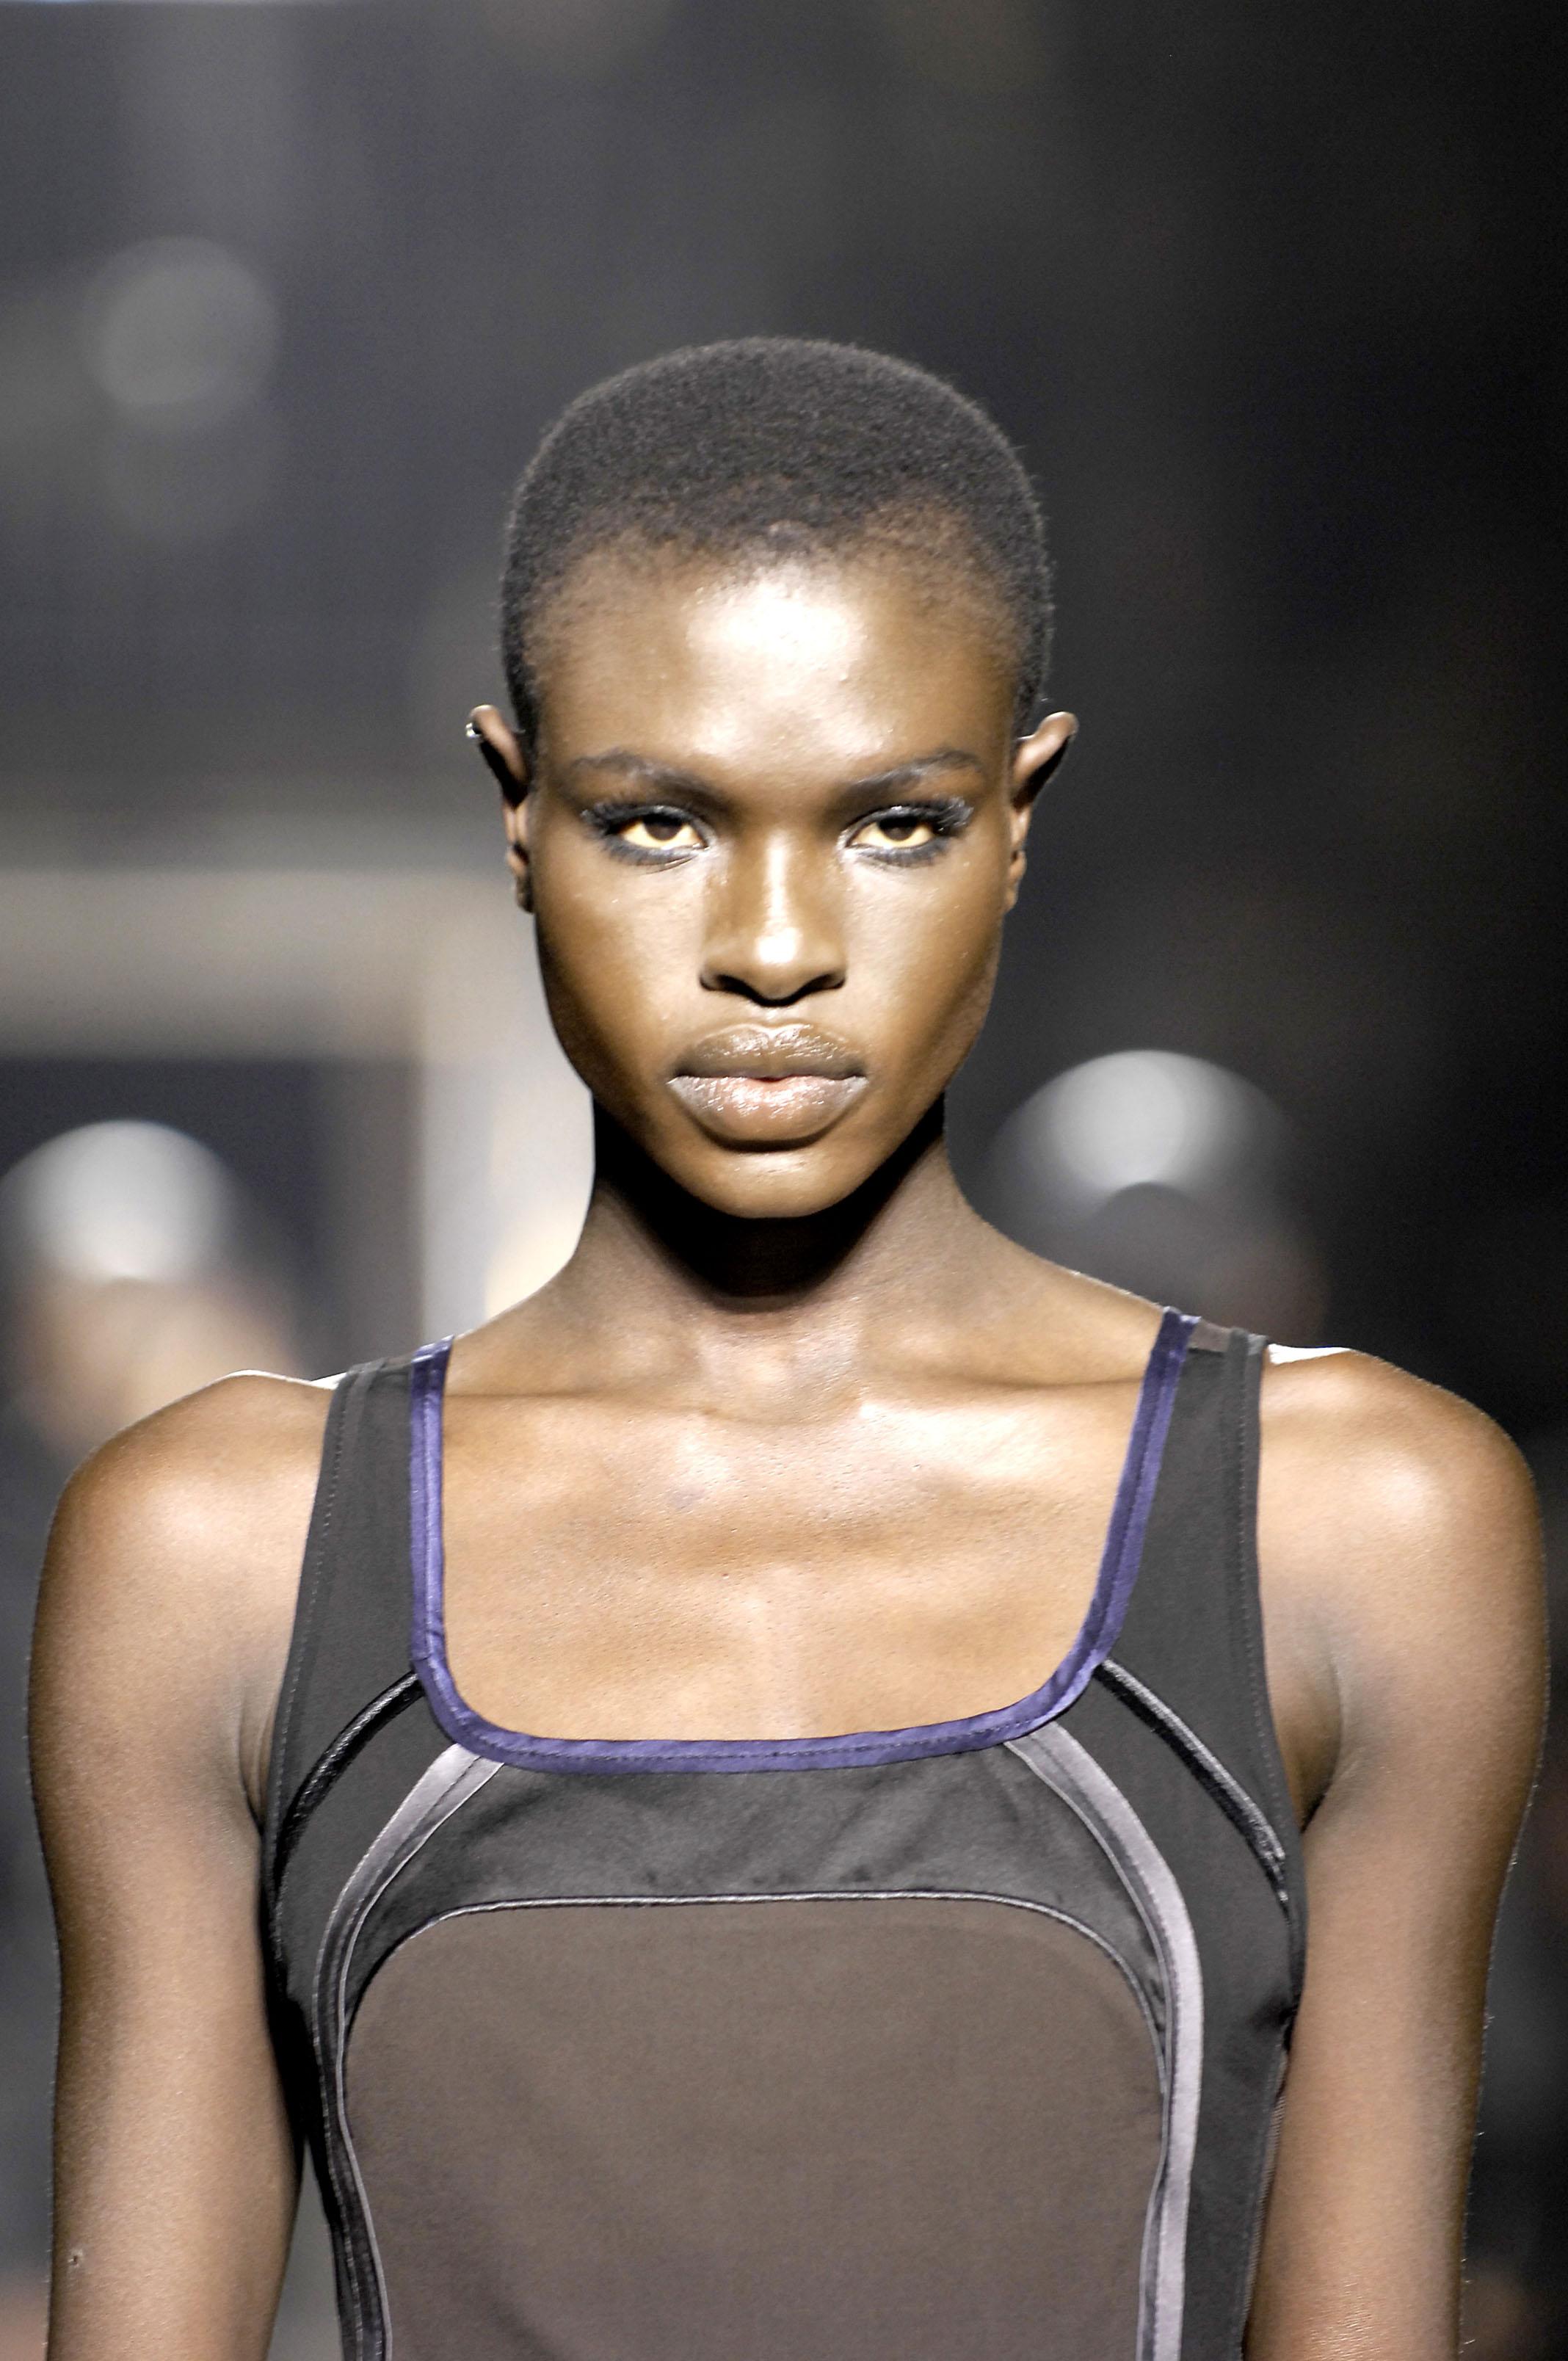 Ajuma Nasenyana KEN 1 2006